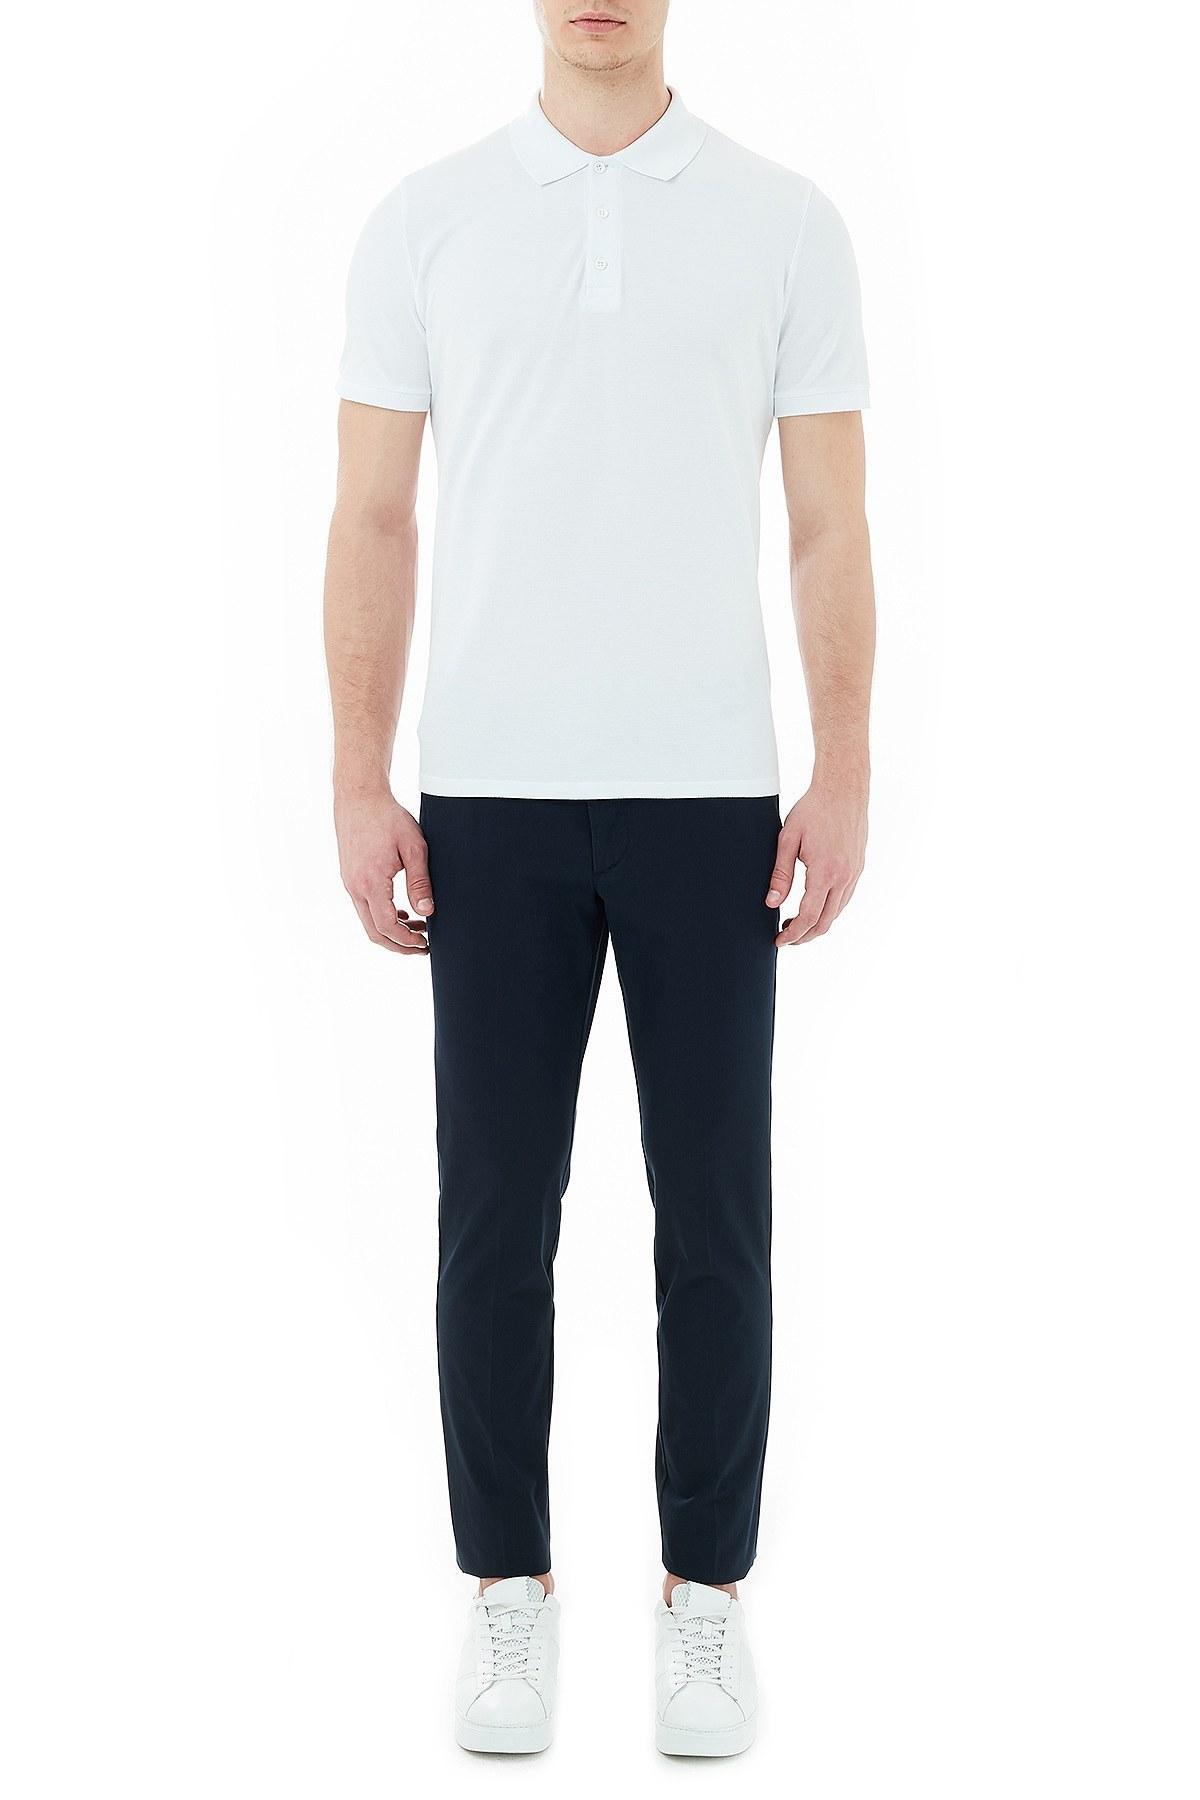 Hugo Boss Slim Fit Cepli Erkek Pantolon 50437895 402 LACİVERT